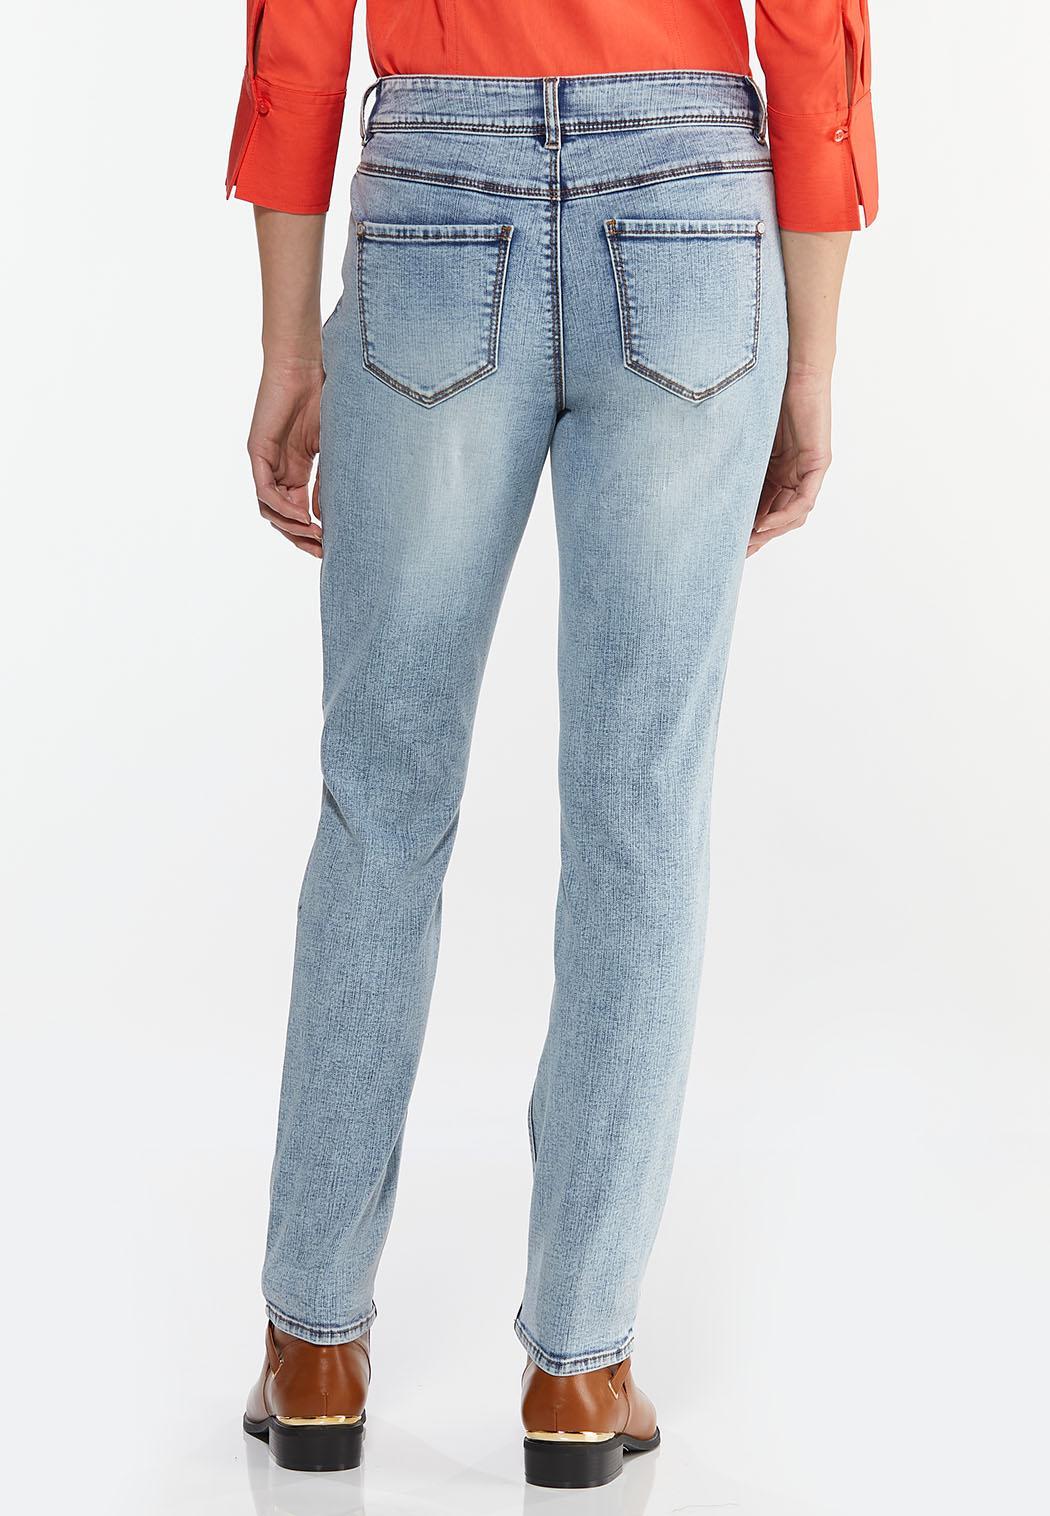 Lightwash Skinny Jeans (Item #44449616)